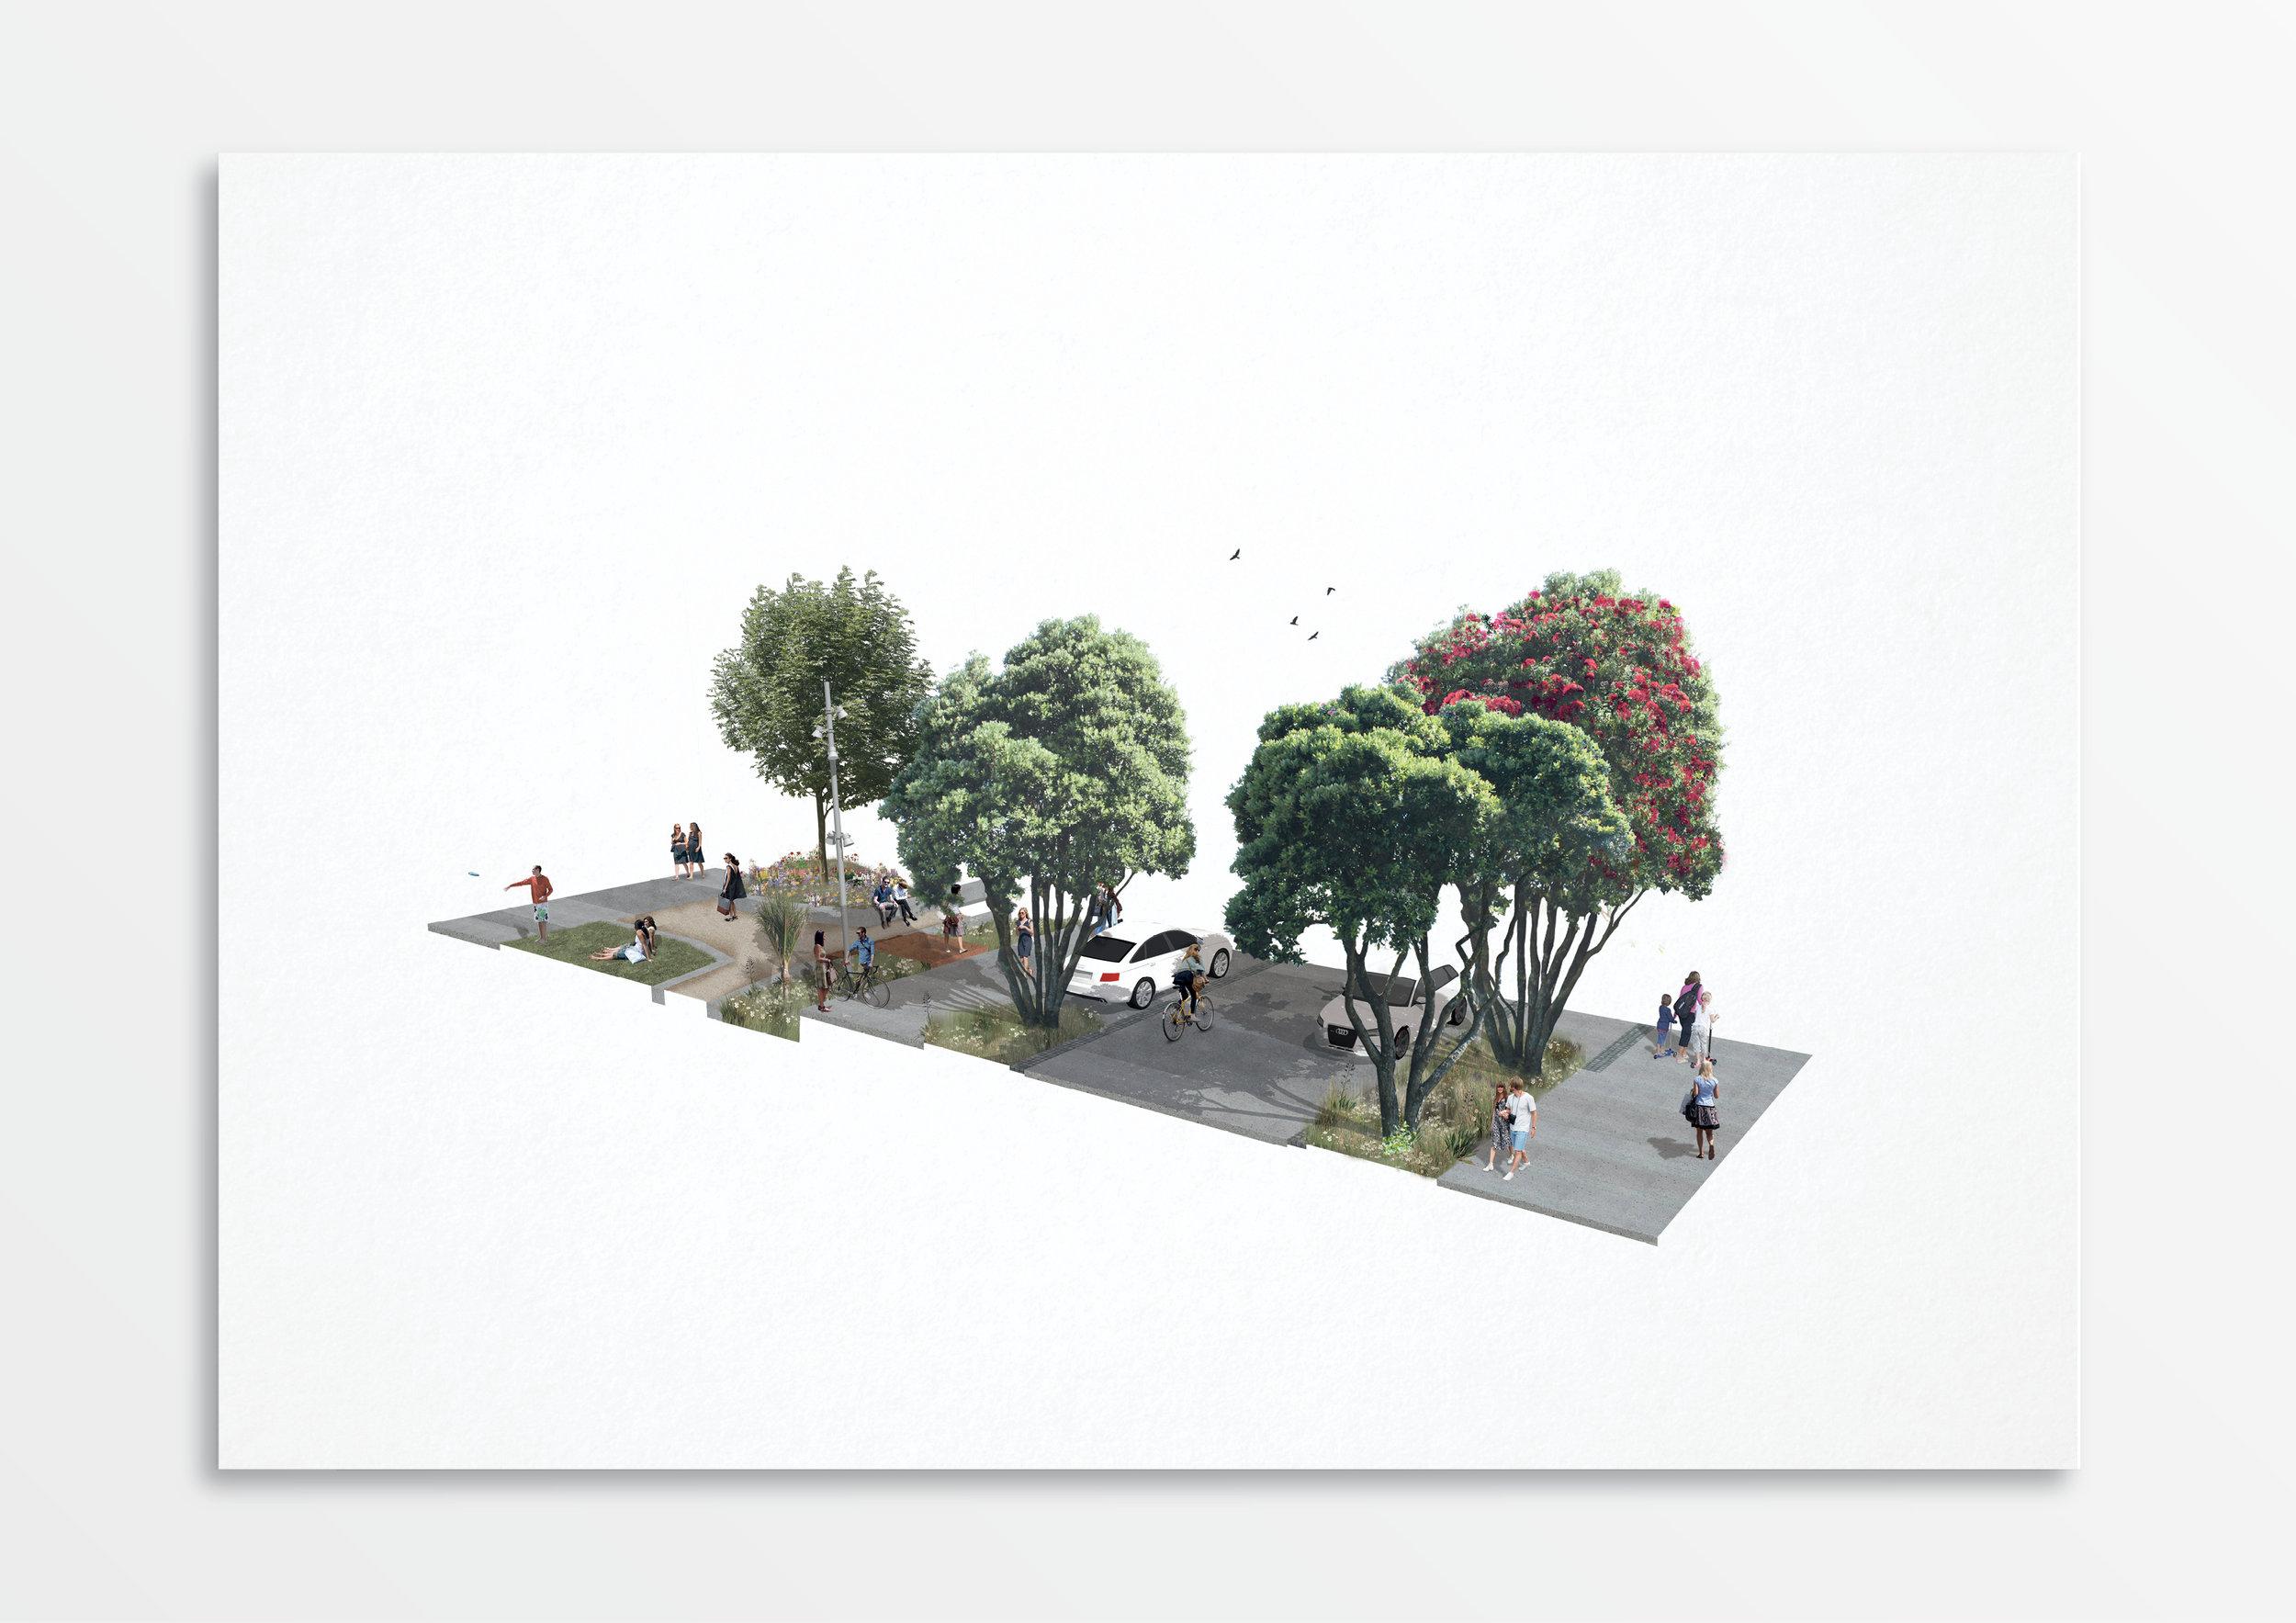 Wyn Com - 3D pages6.jpg